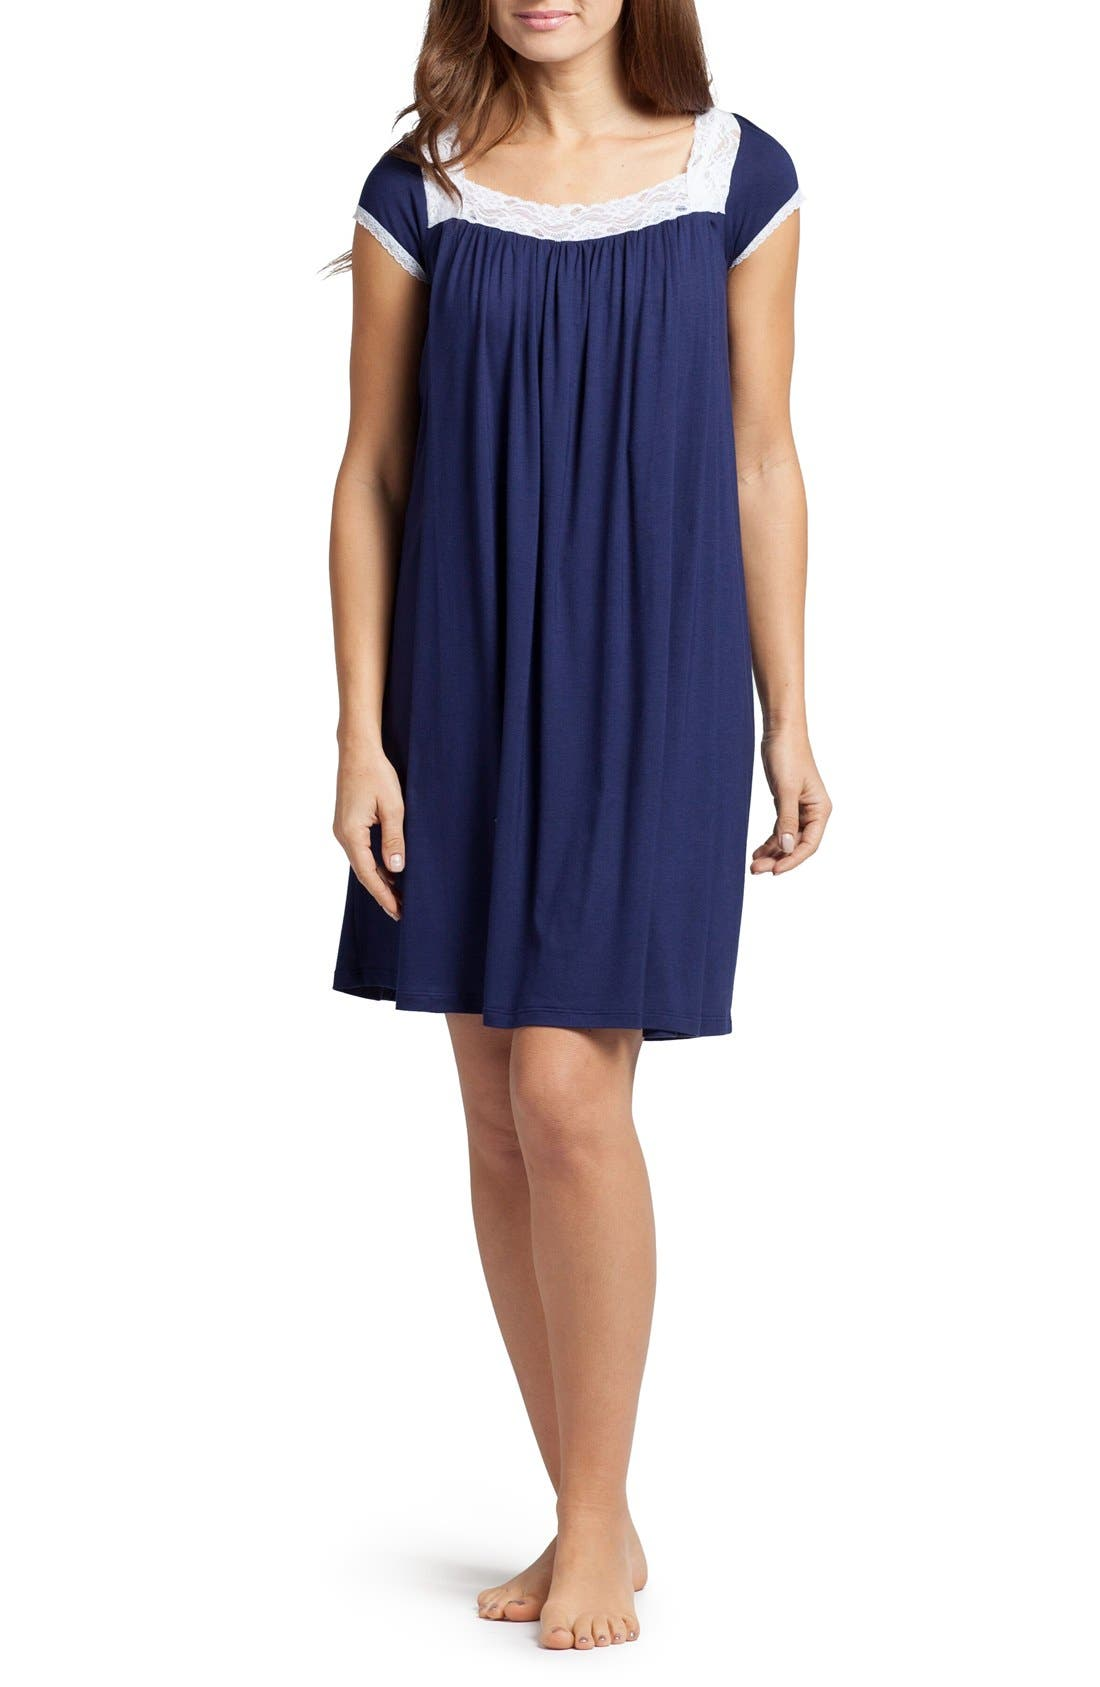 SAVI MOM 'The Lace' Maternity/Nursing Nightgown